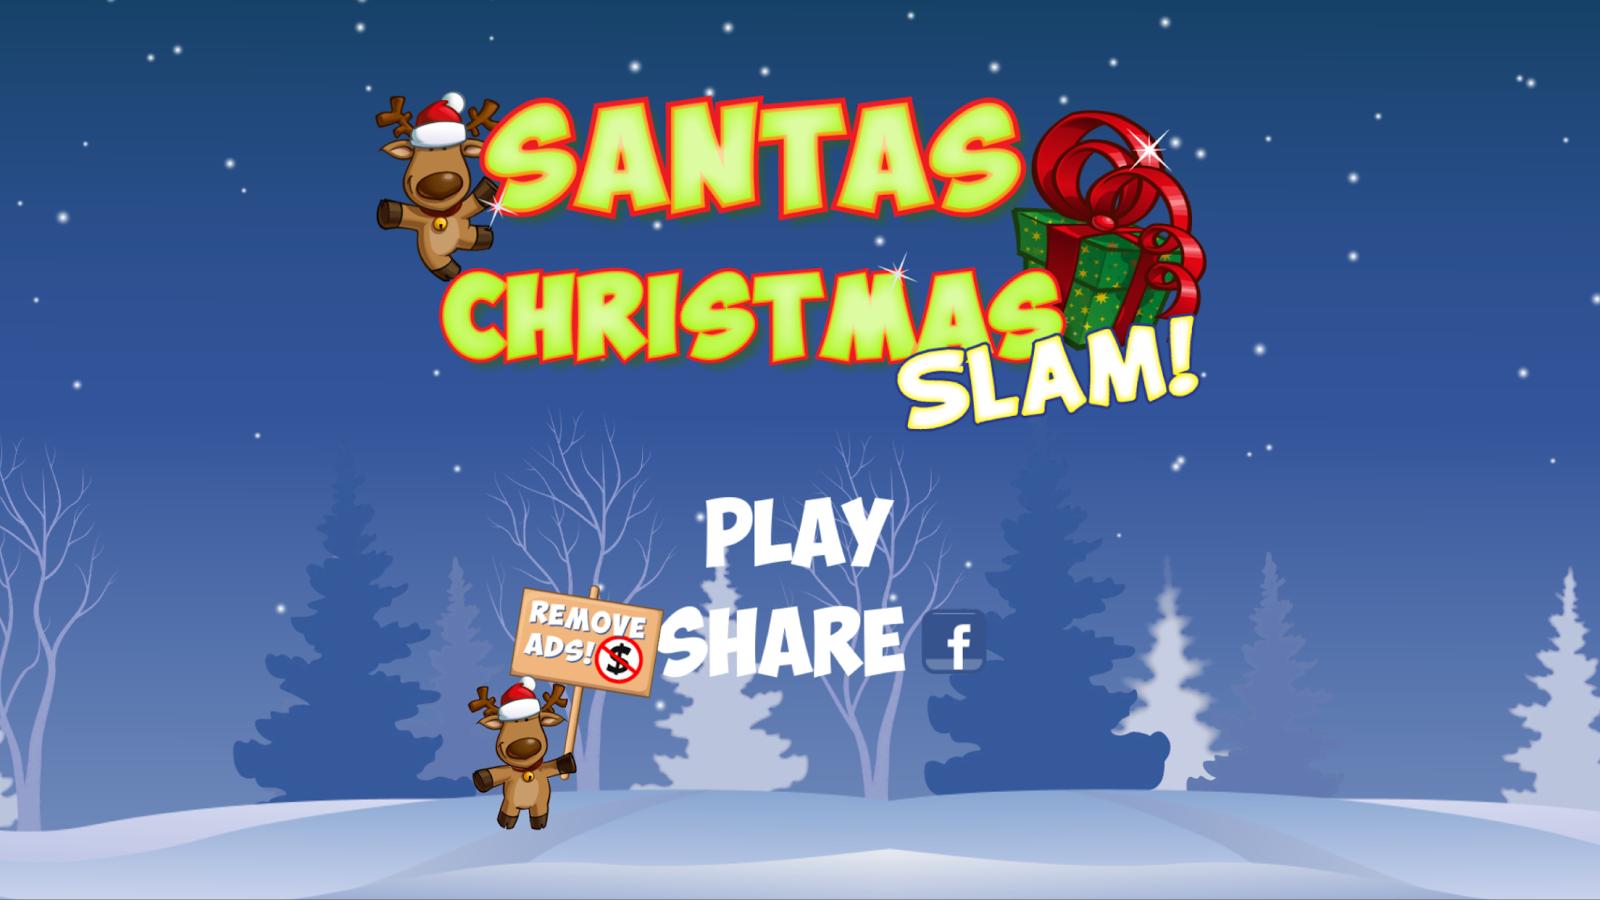 Santas-Christmas-Slam 24